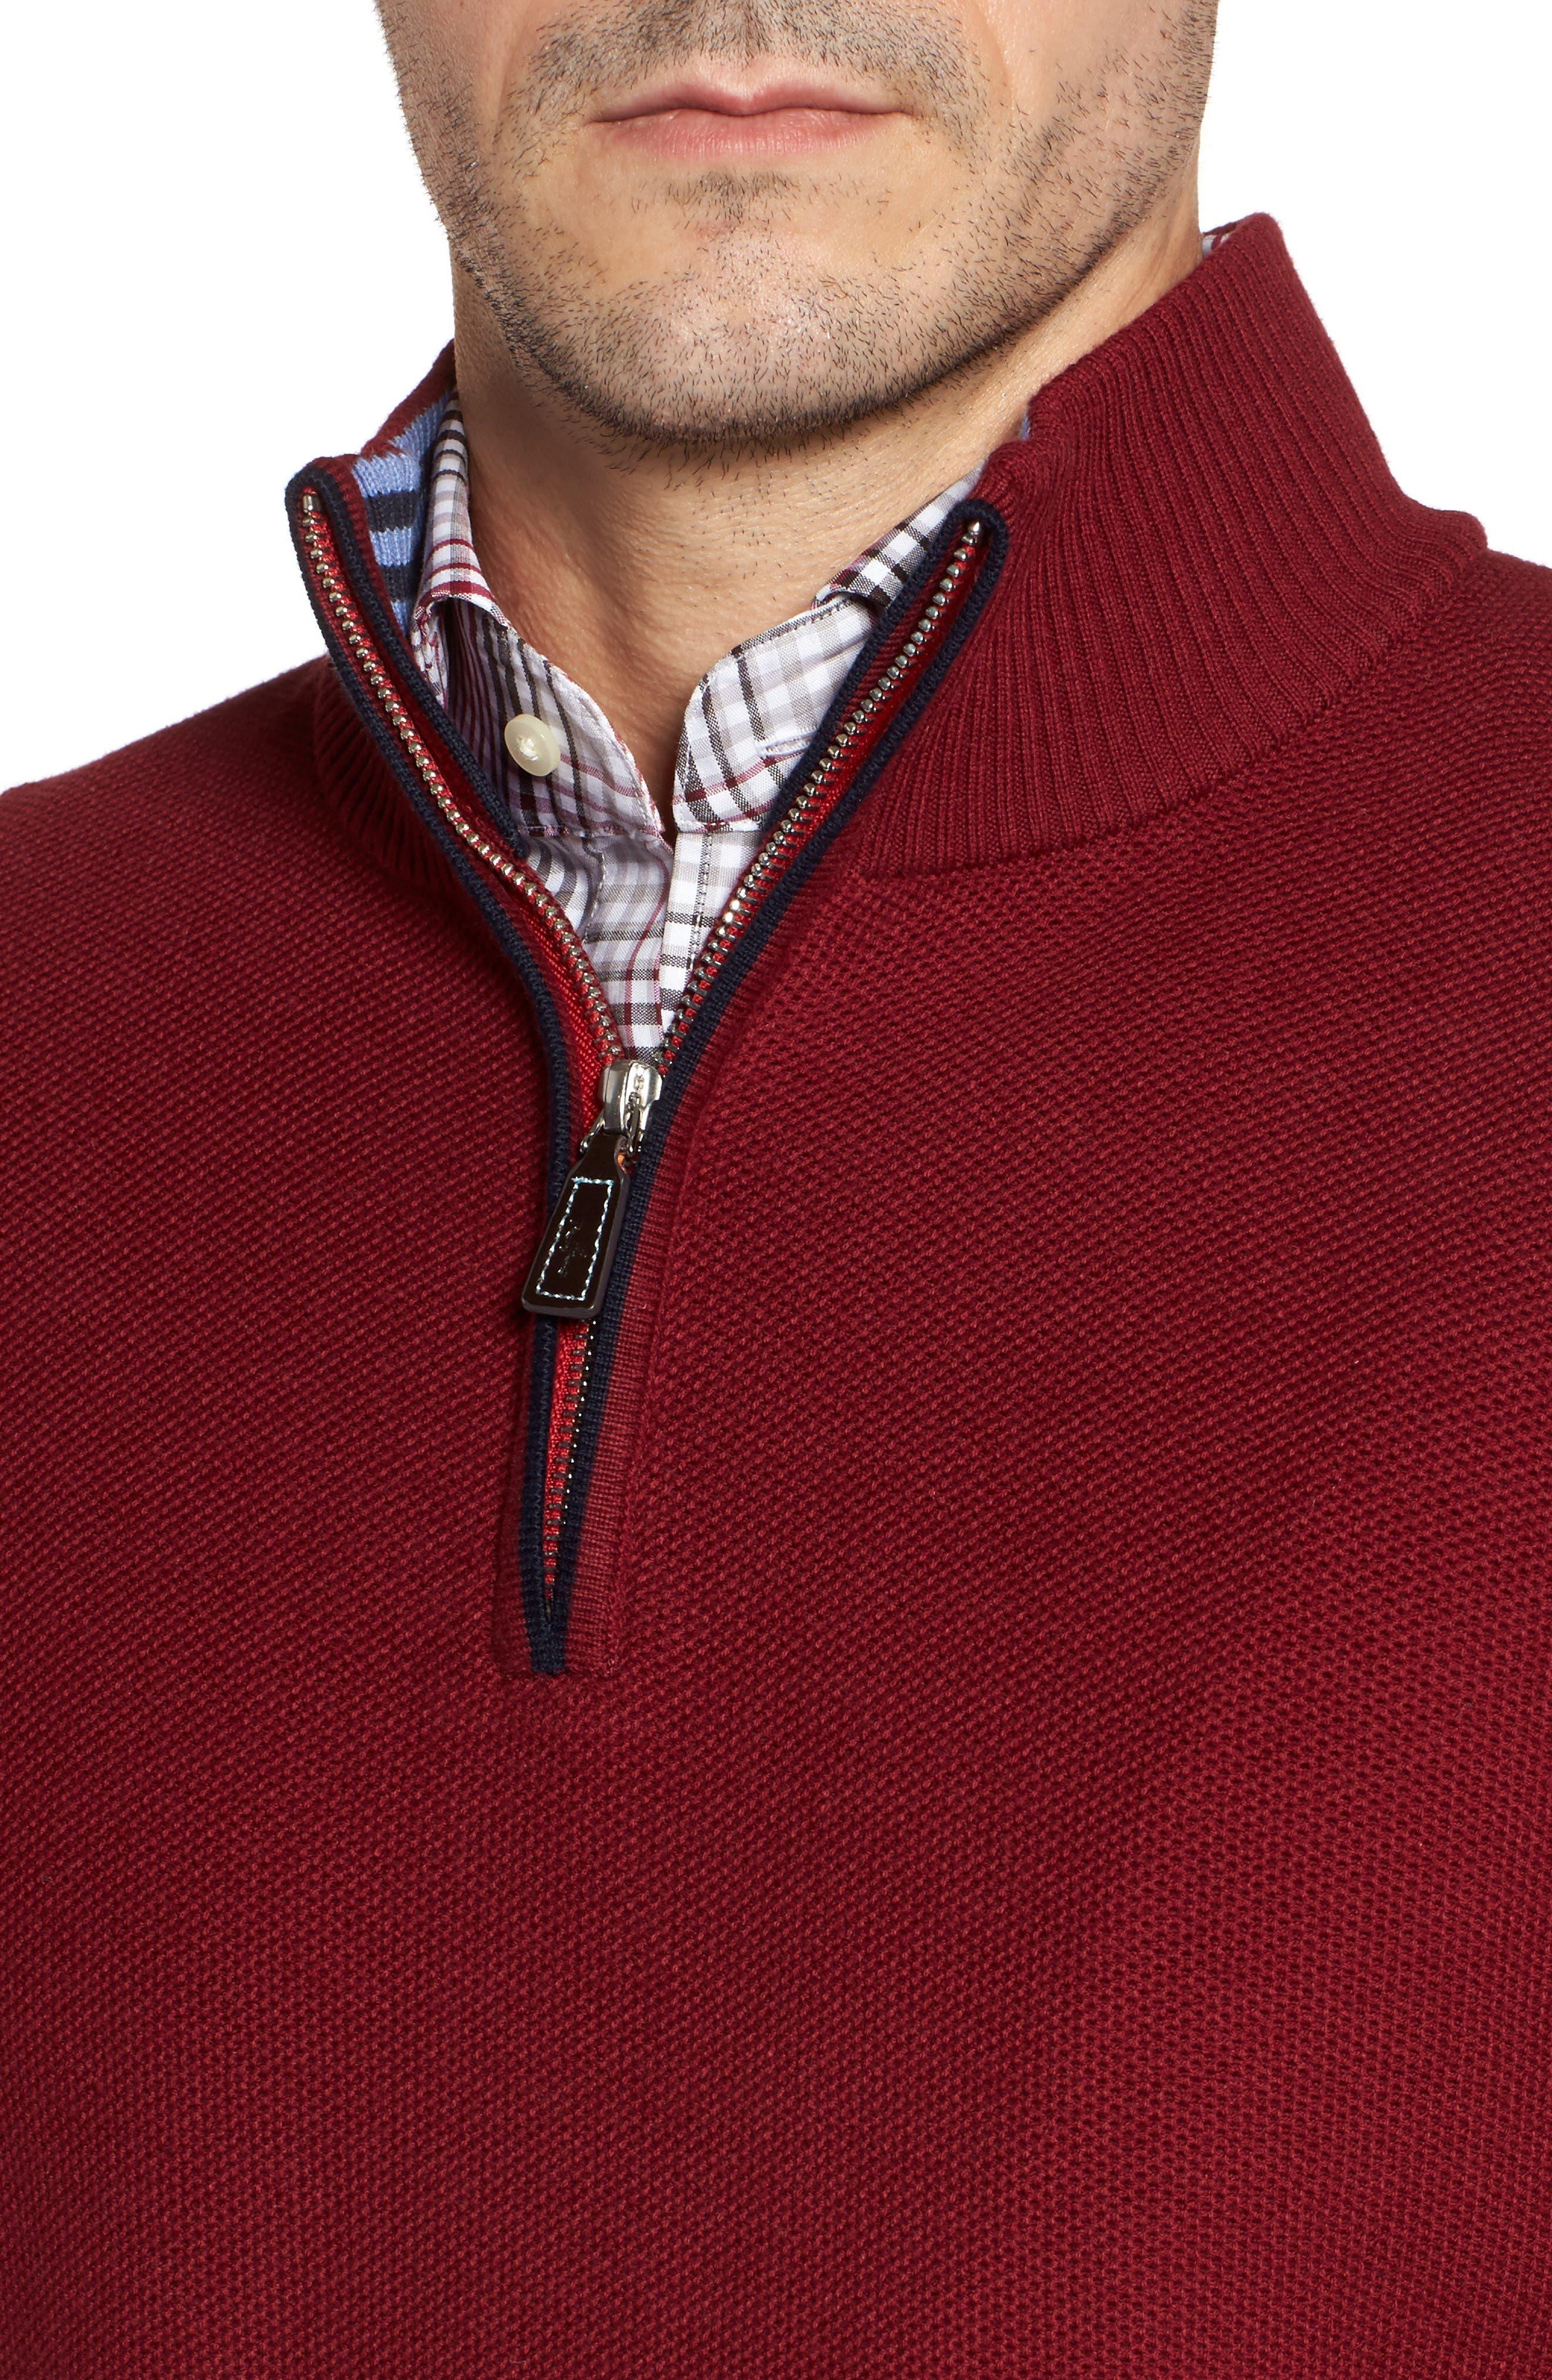 Alternate Image 4  - TailorByrd Prien Tipped Quarter Zip Sweater